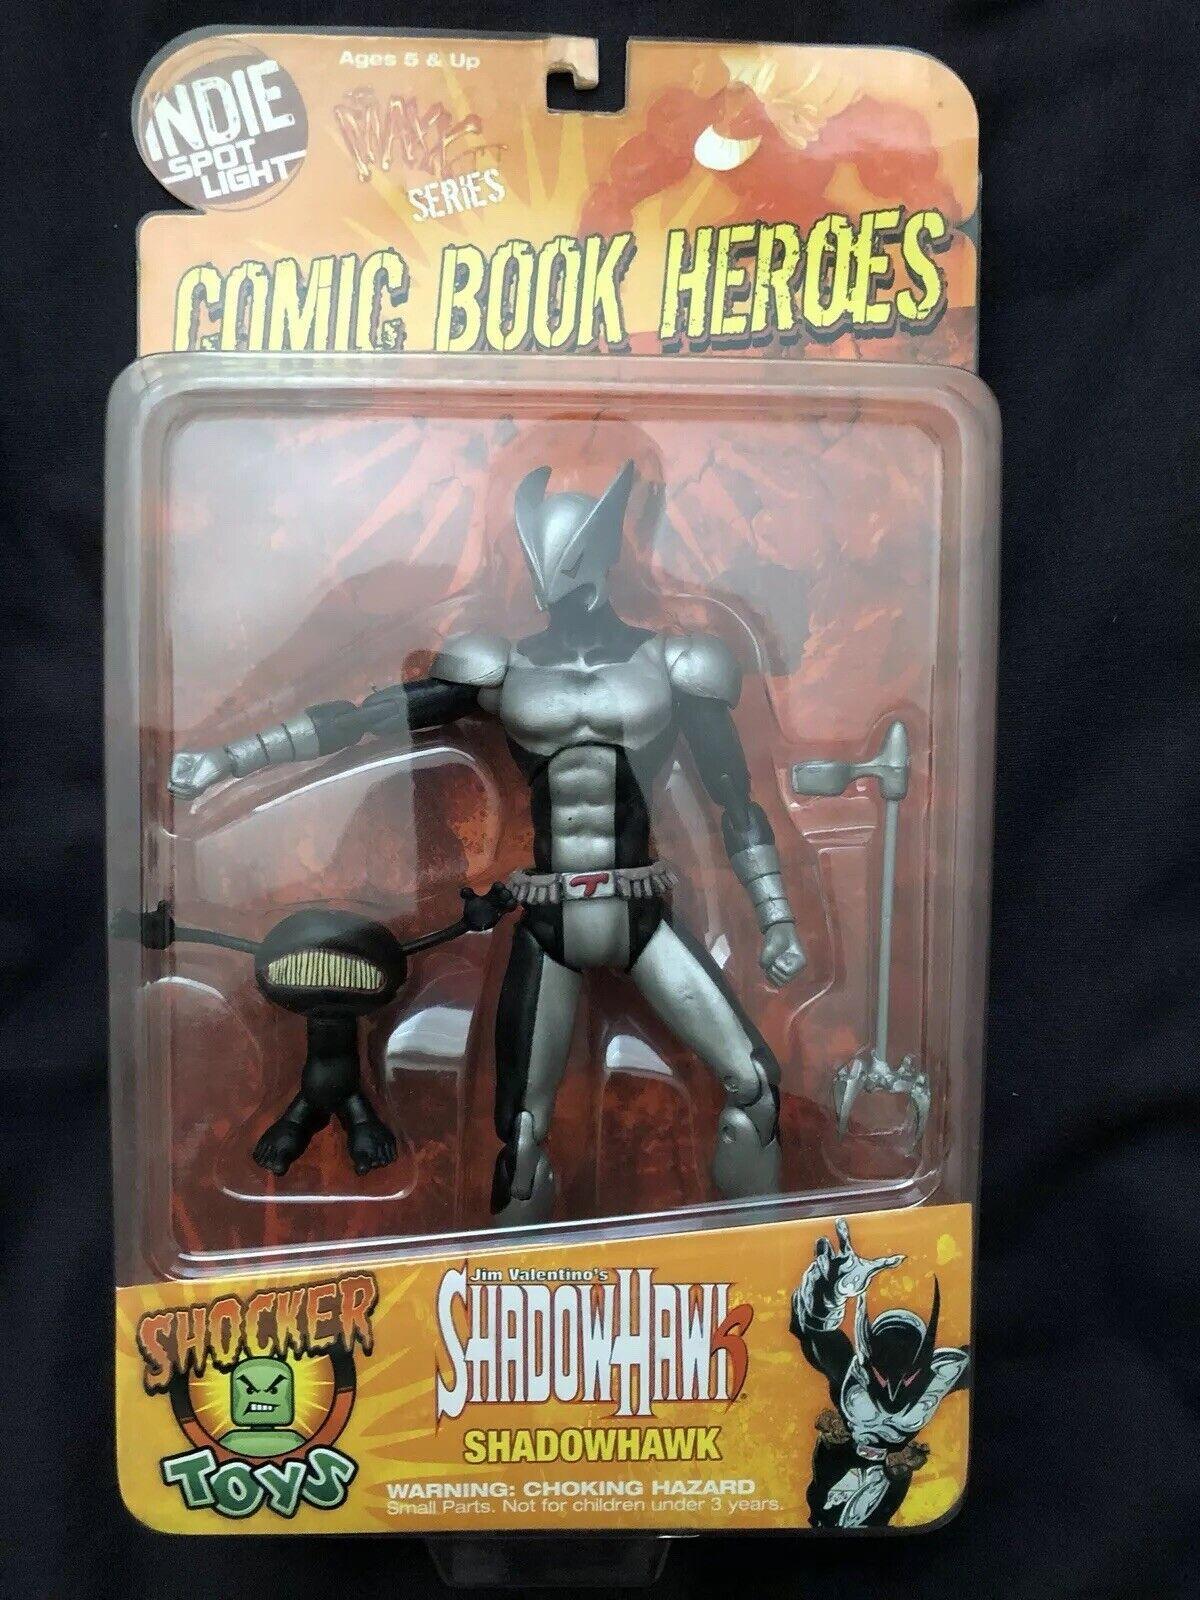 Indie Spot Light Comic Book Heroes ShadowHawk Shocker Toys Shadow